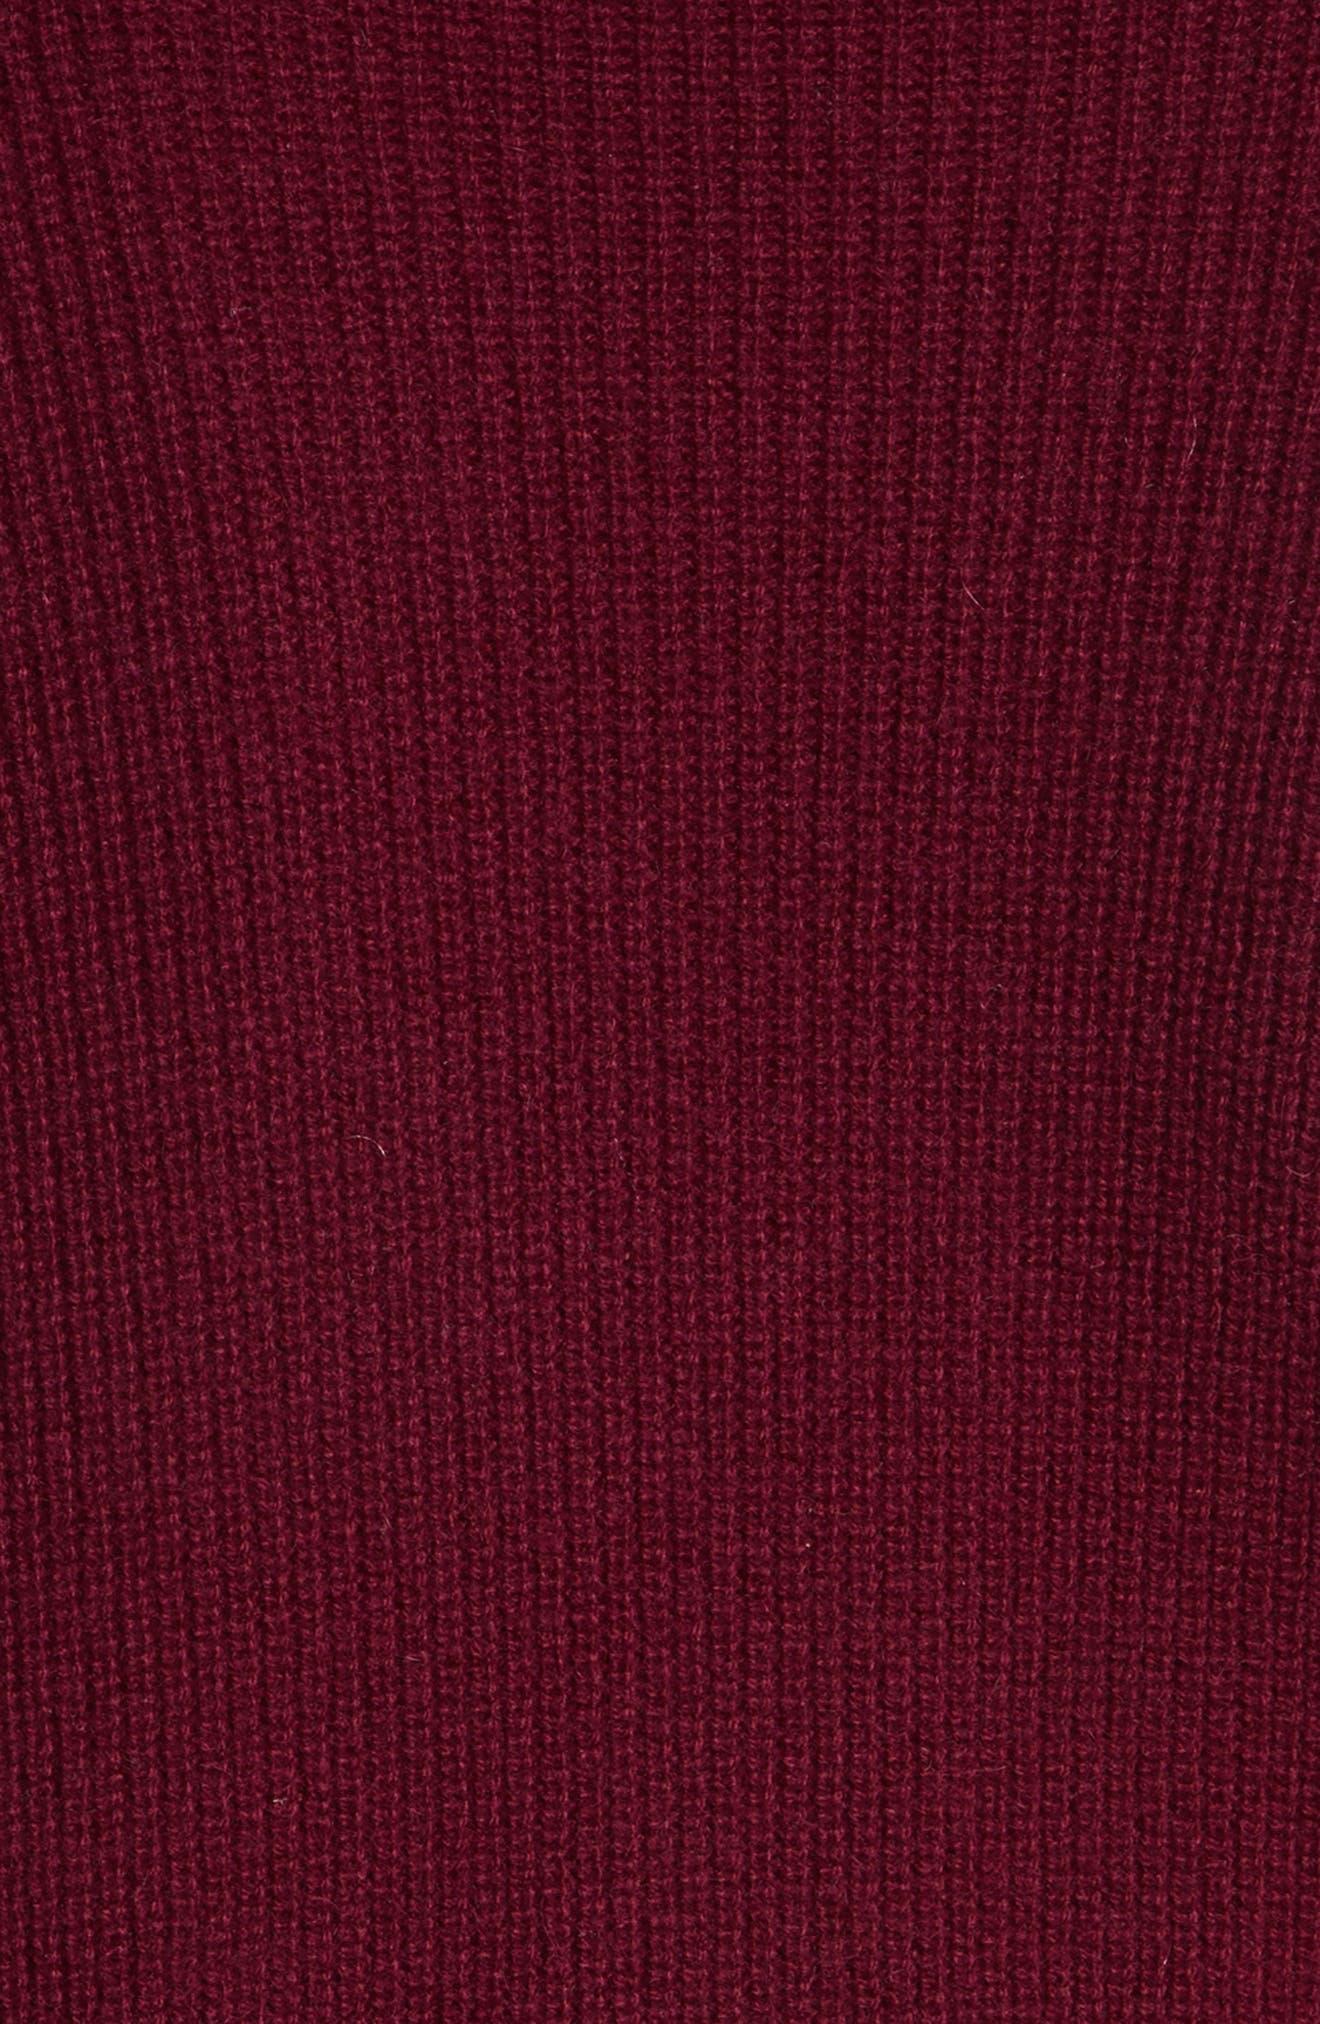 Cold Shoulder Cashmere Pullover,                             Alternate thumbnail 10, color,